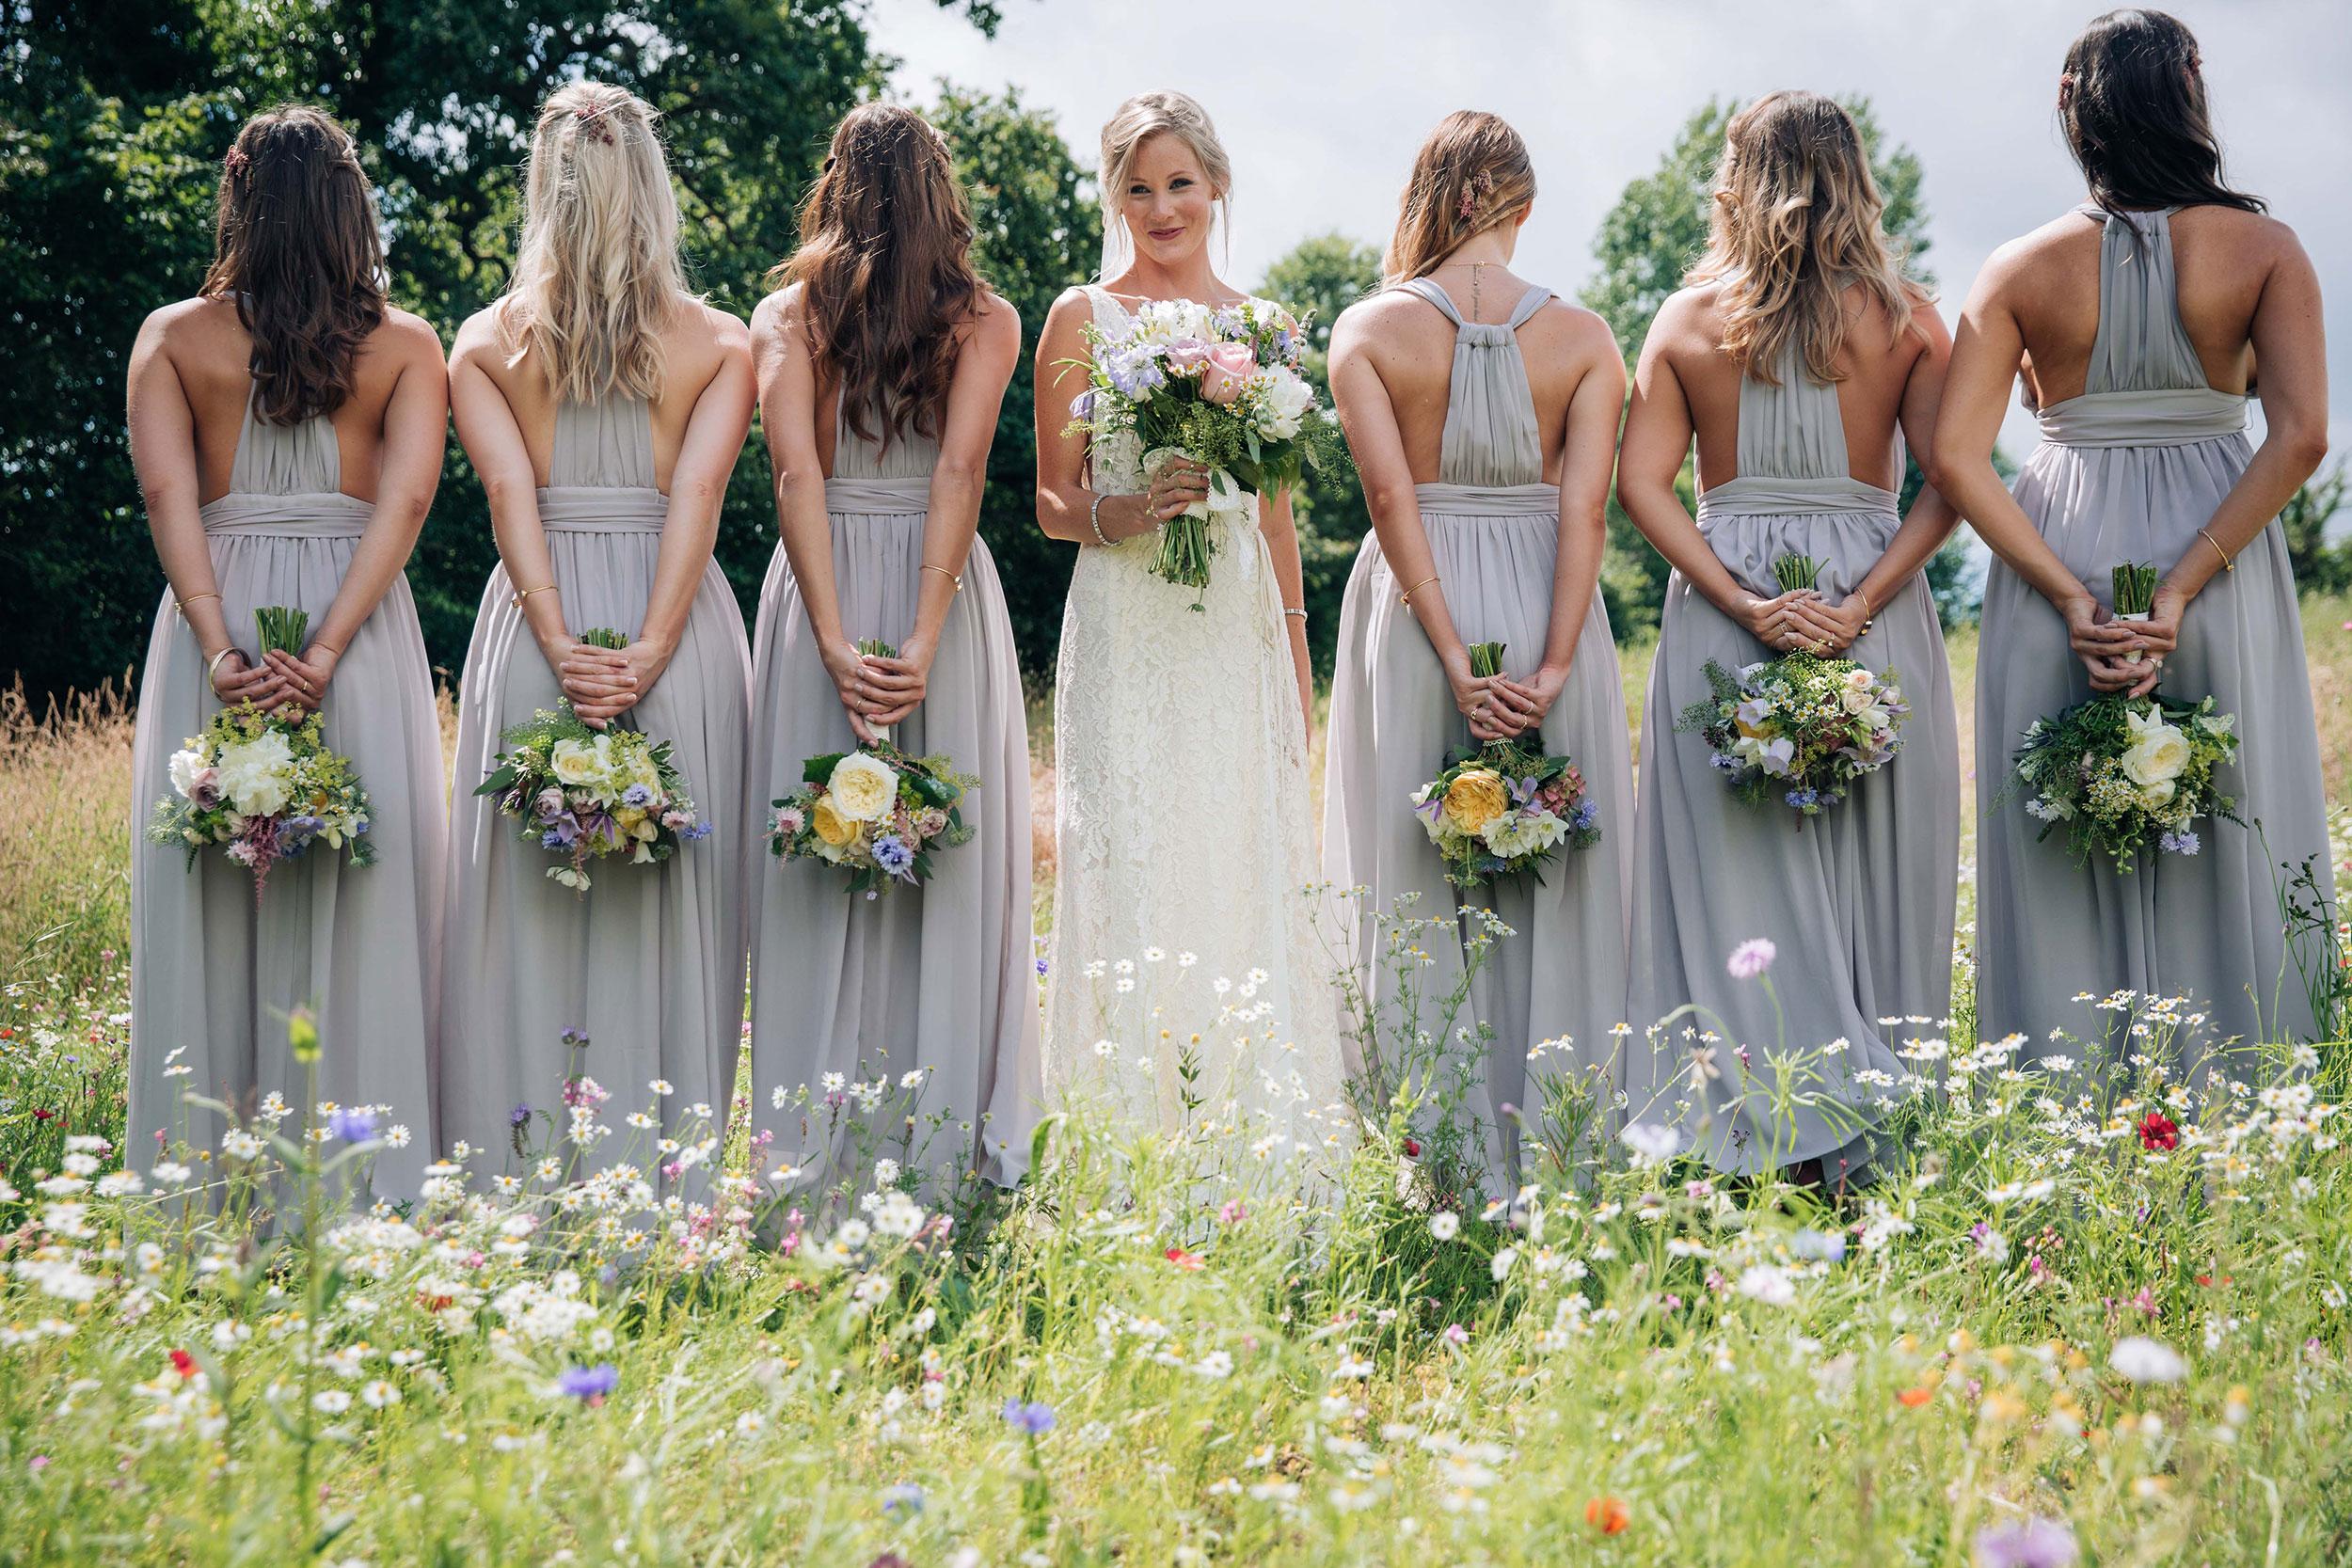 16.07.16-Tanya-&-Jethro-Wedding-Selection-41.jpg